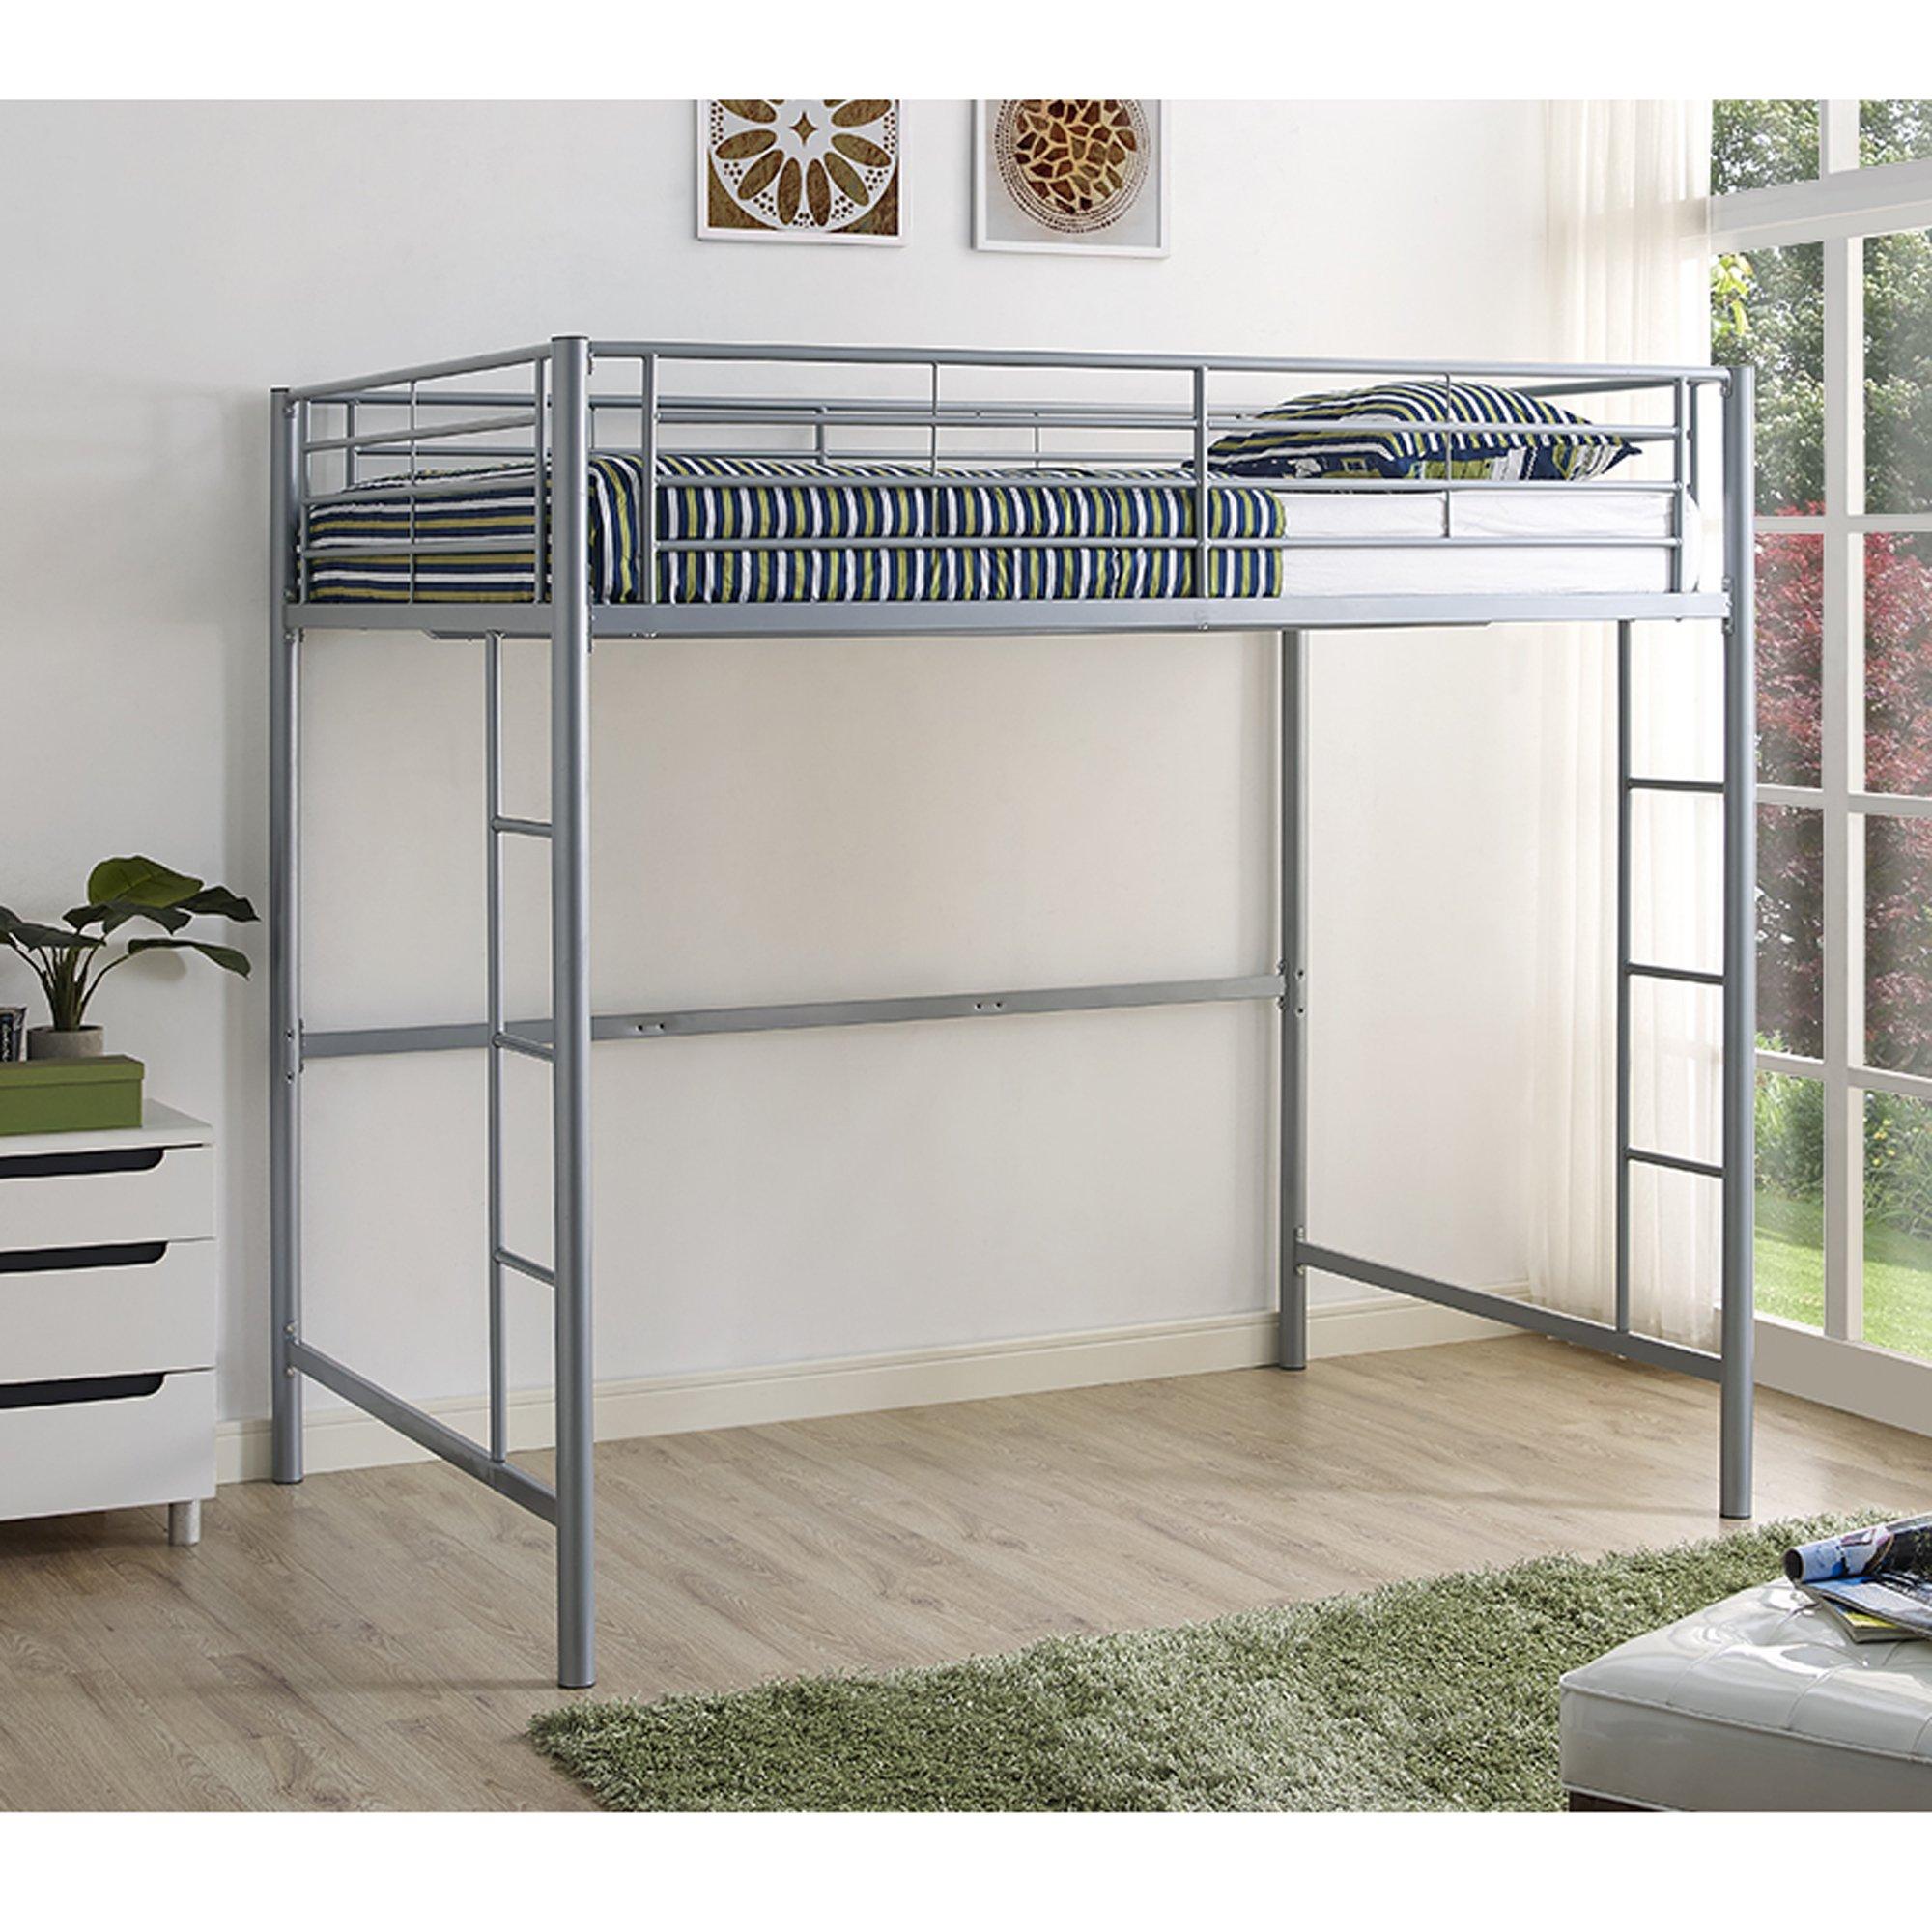 WE Furniture Full Metal Loft Bed - Silver